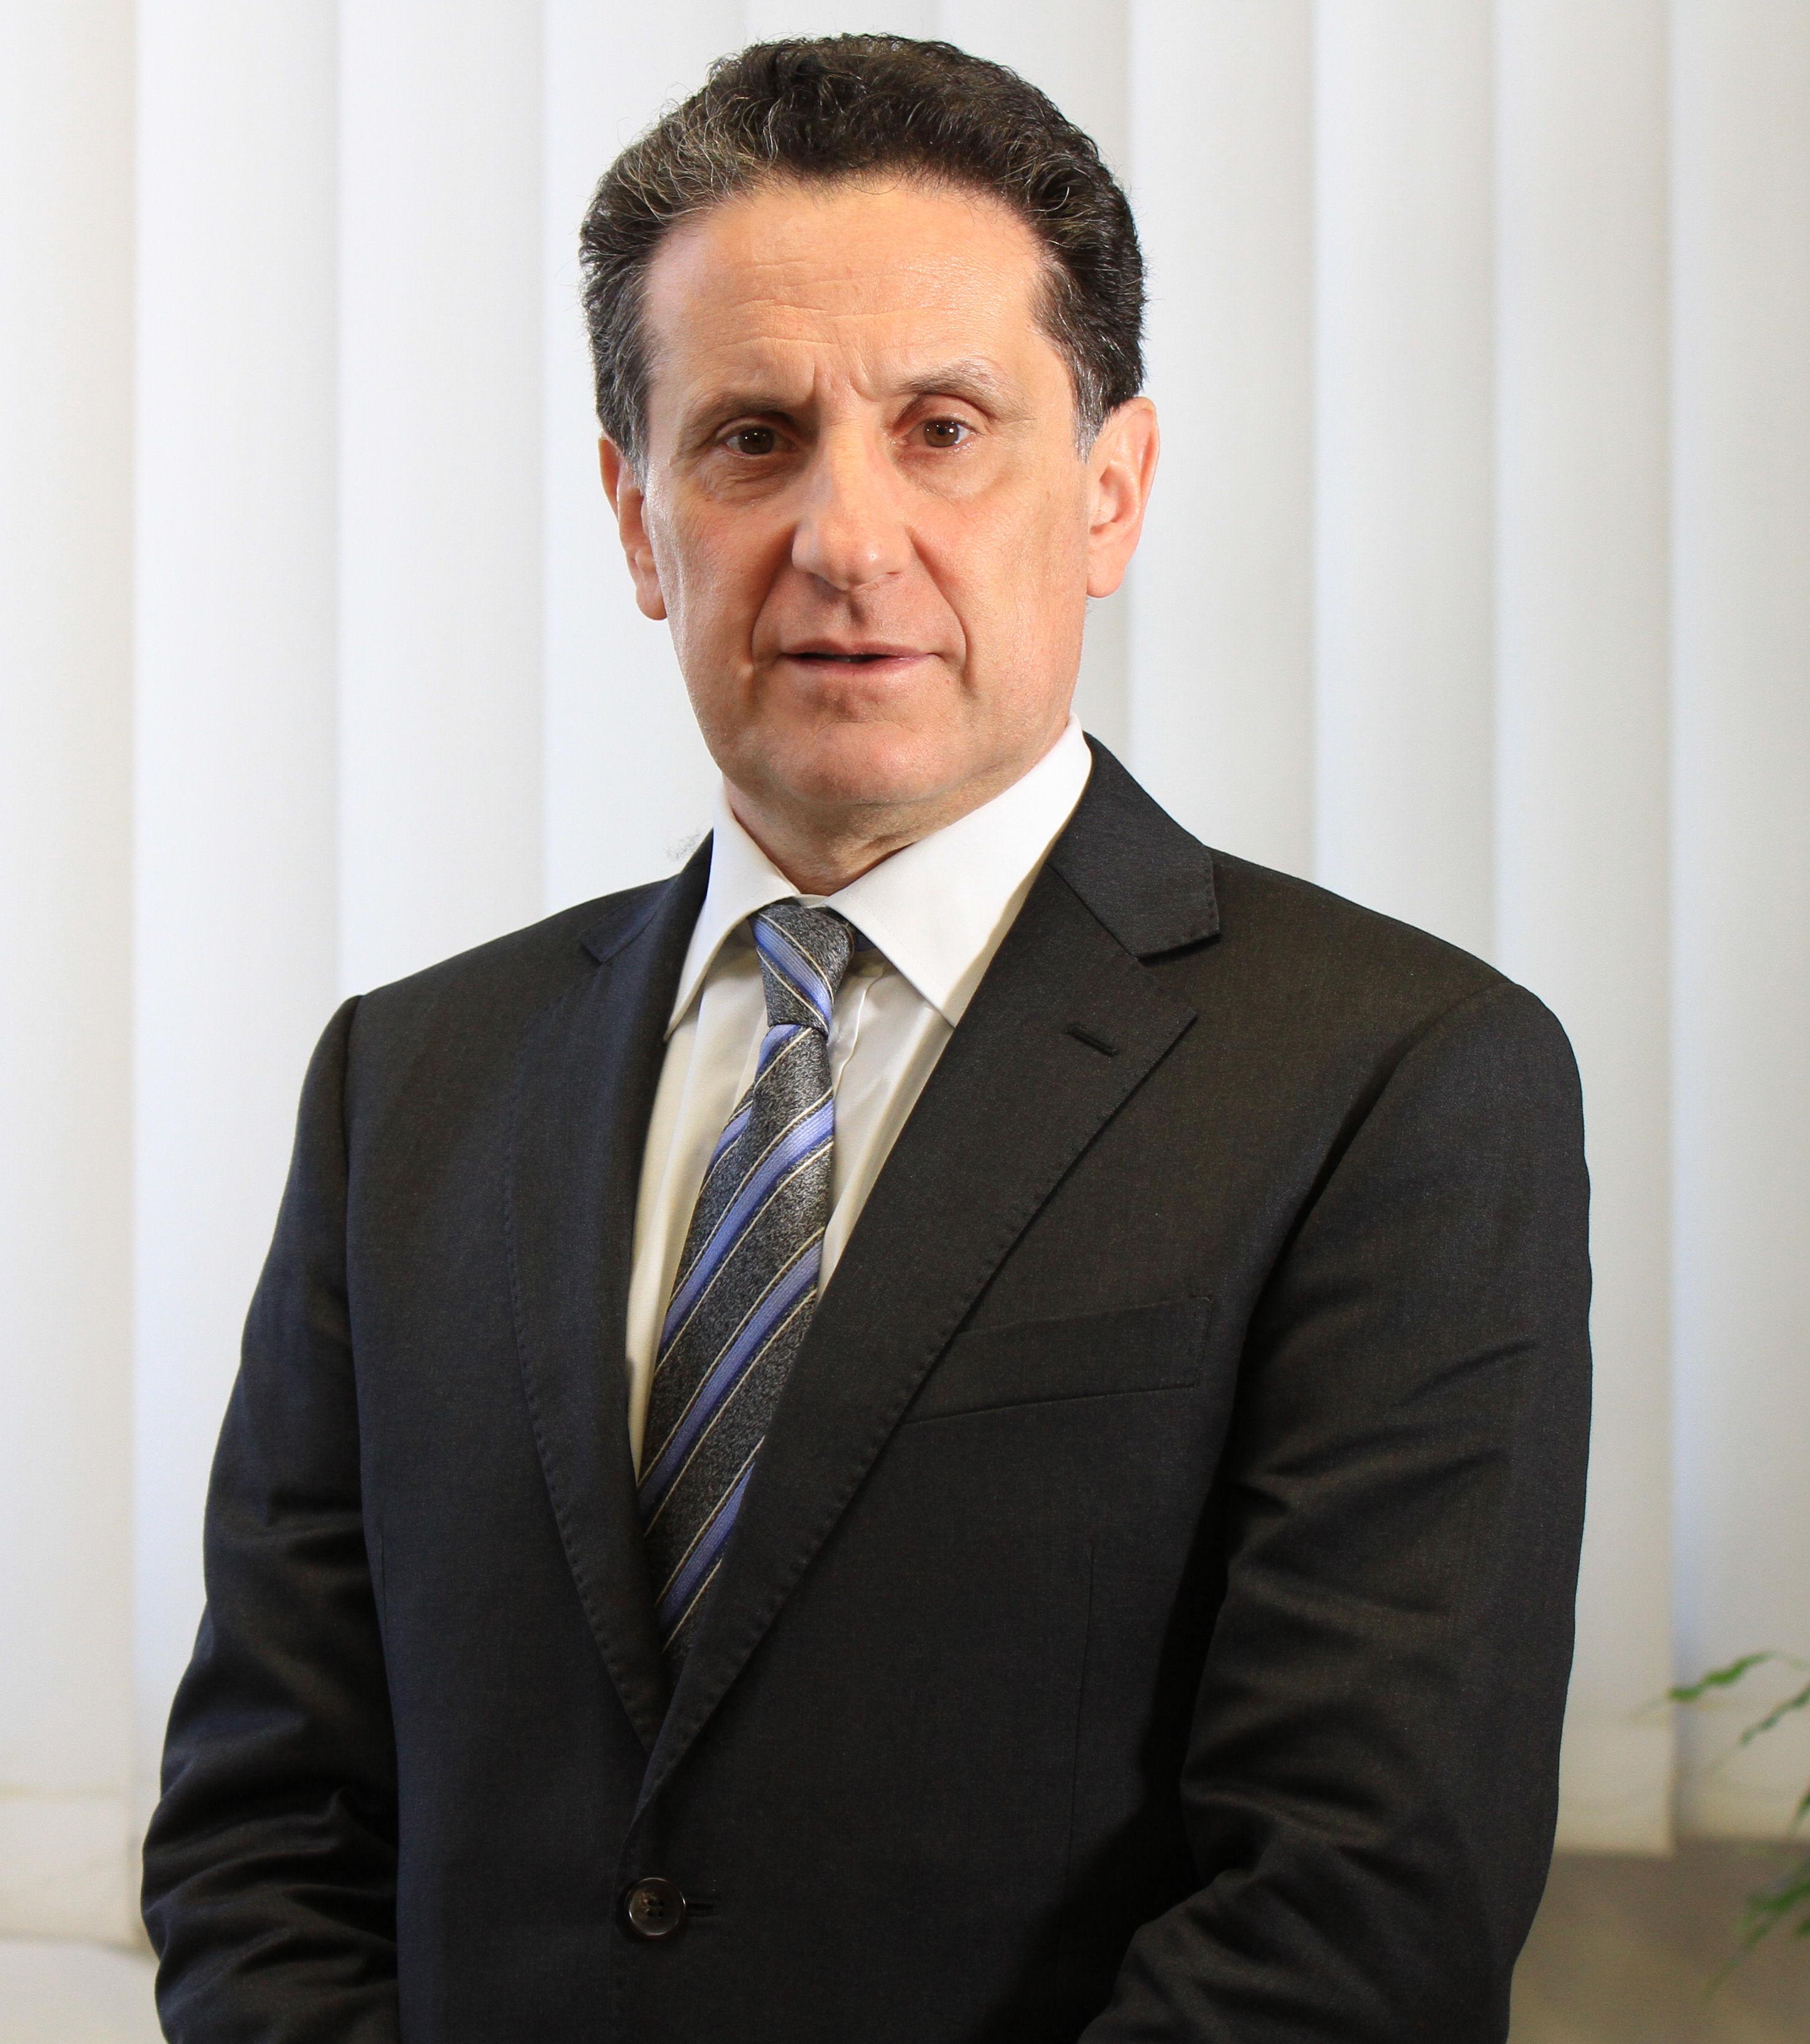 Fabrizio Scovenna 2017